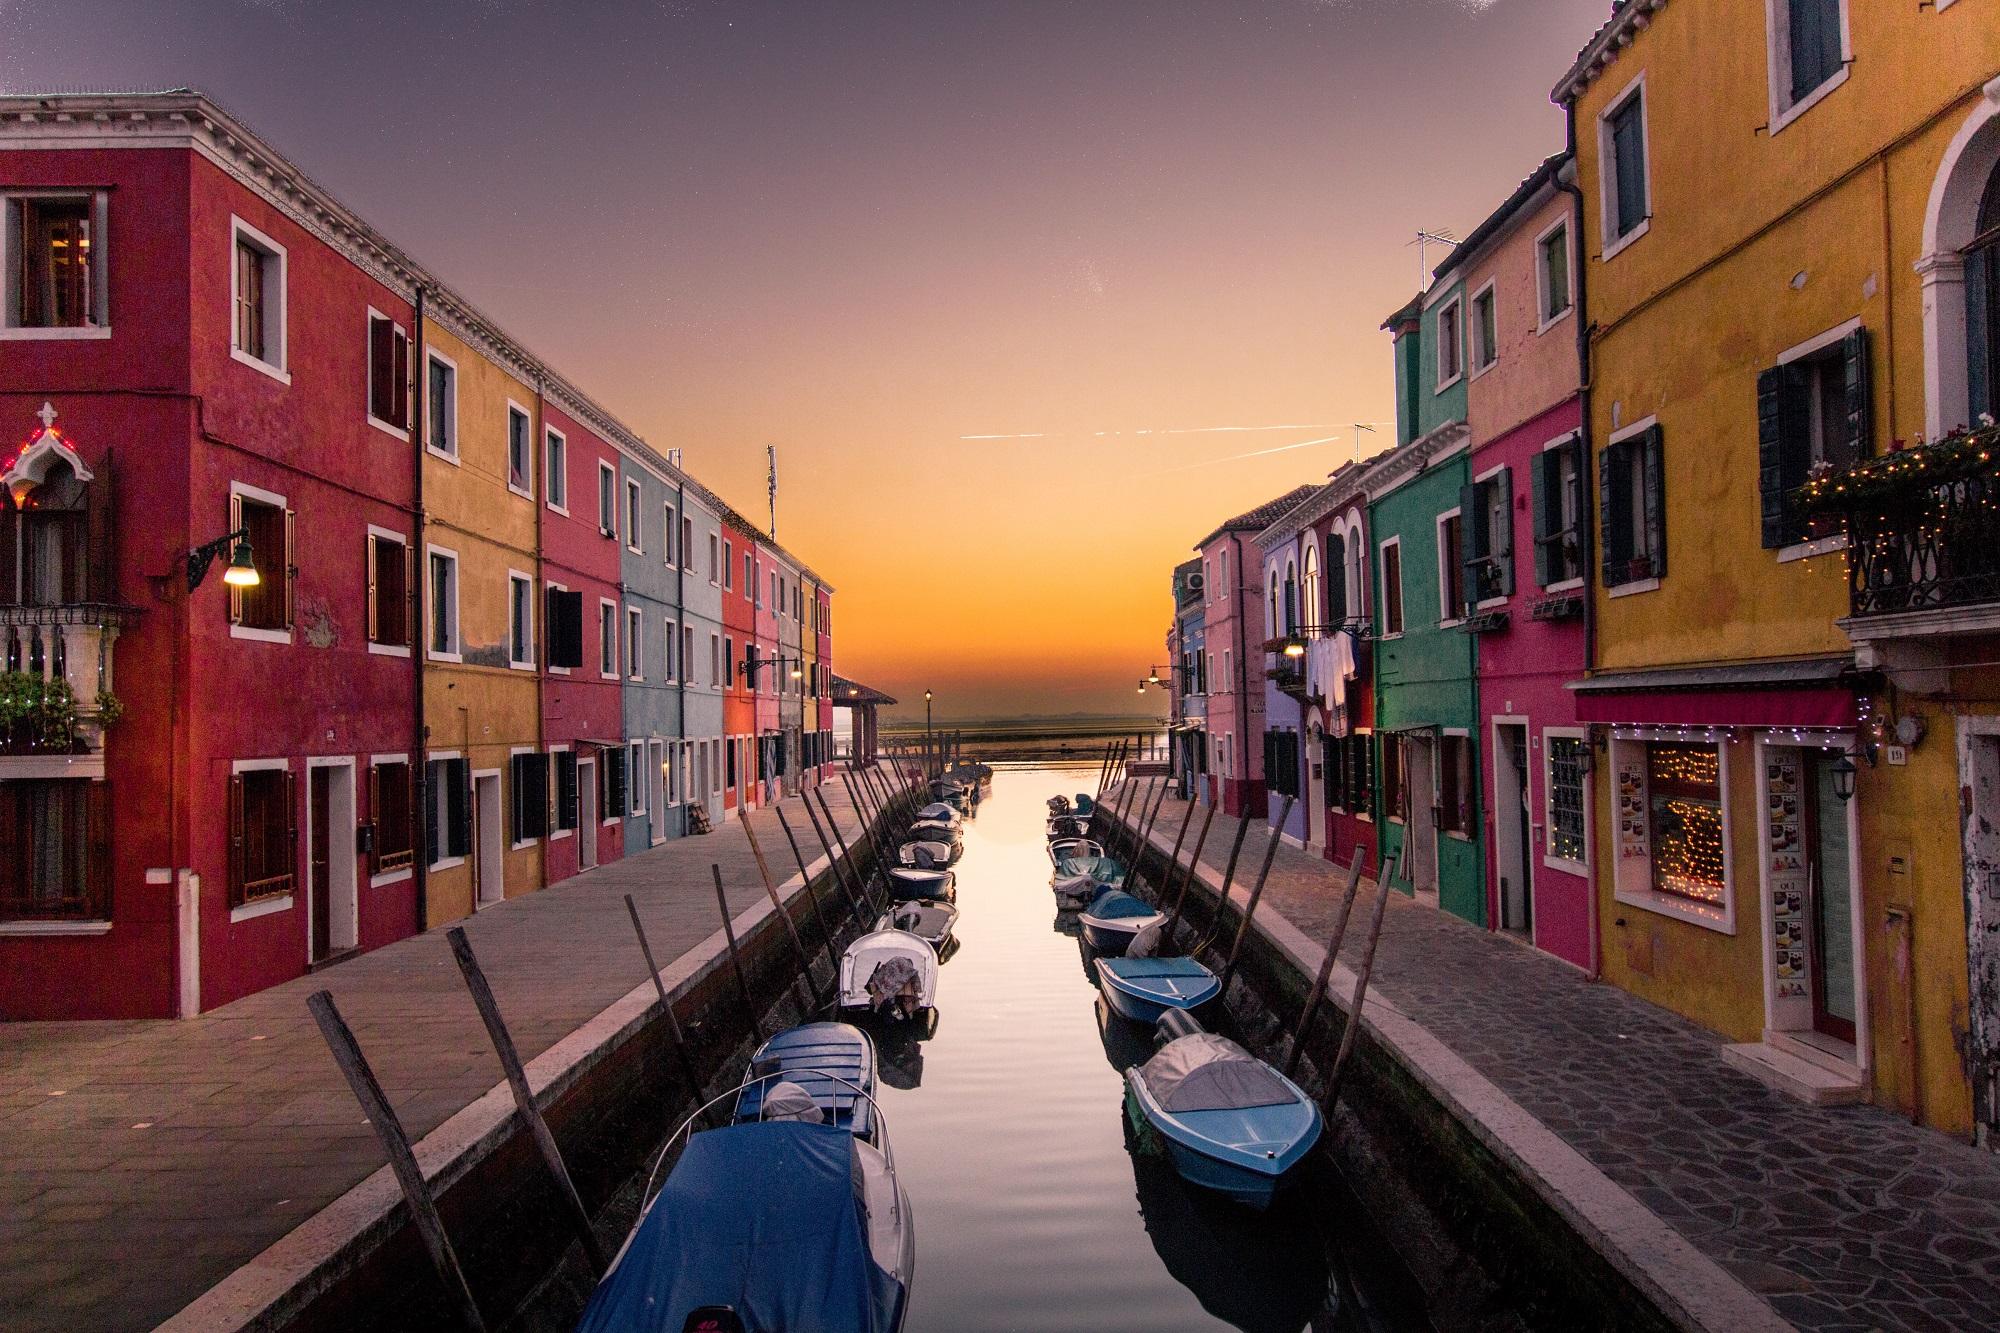 How to Plan a Romantic Venice Getaway